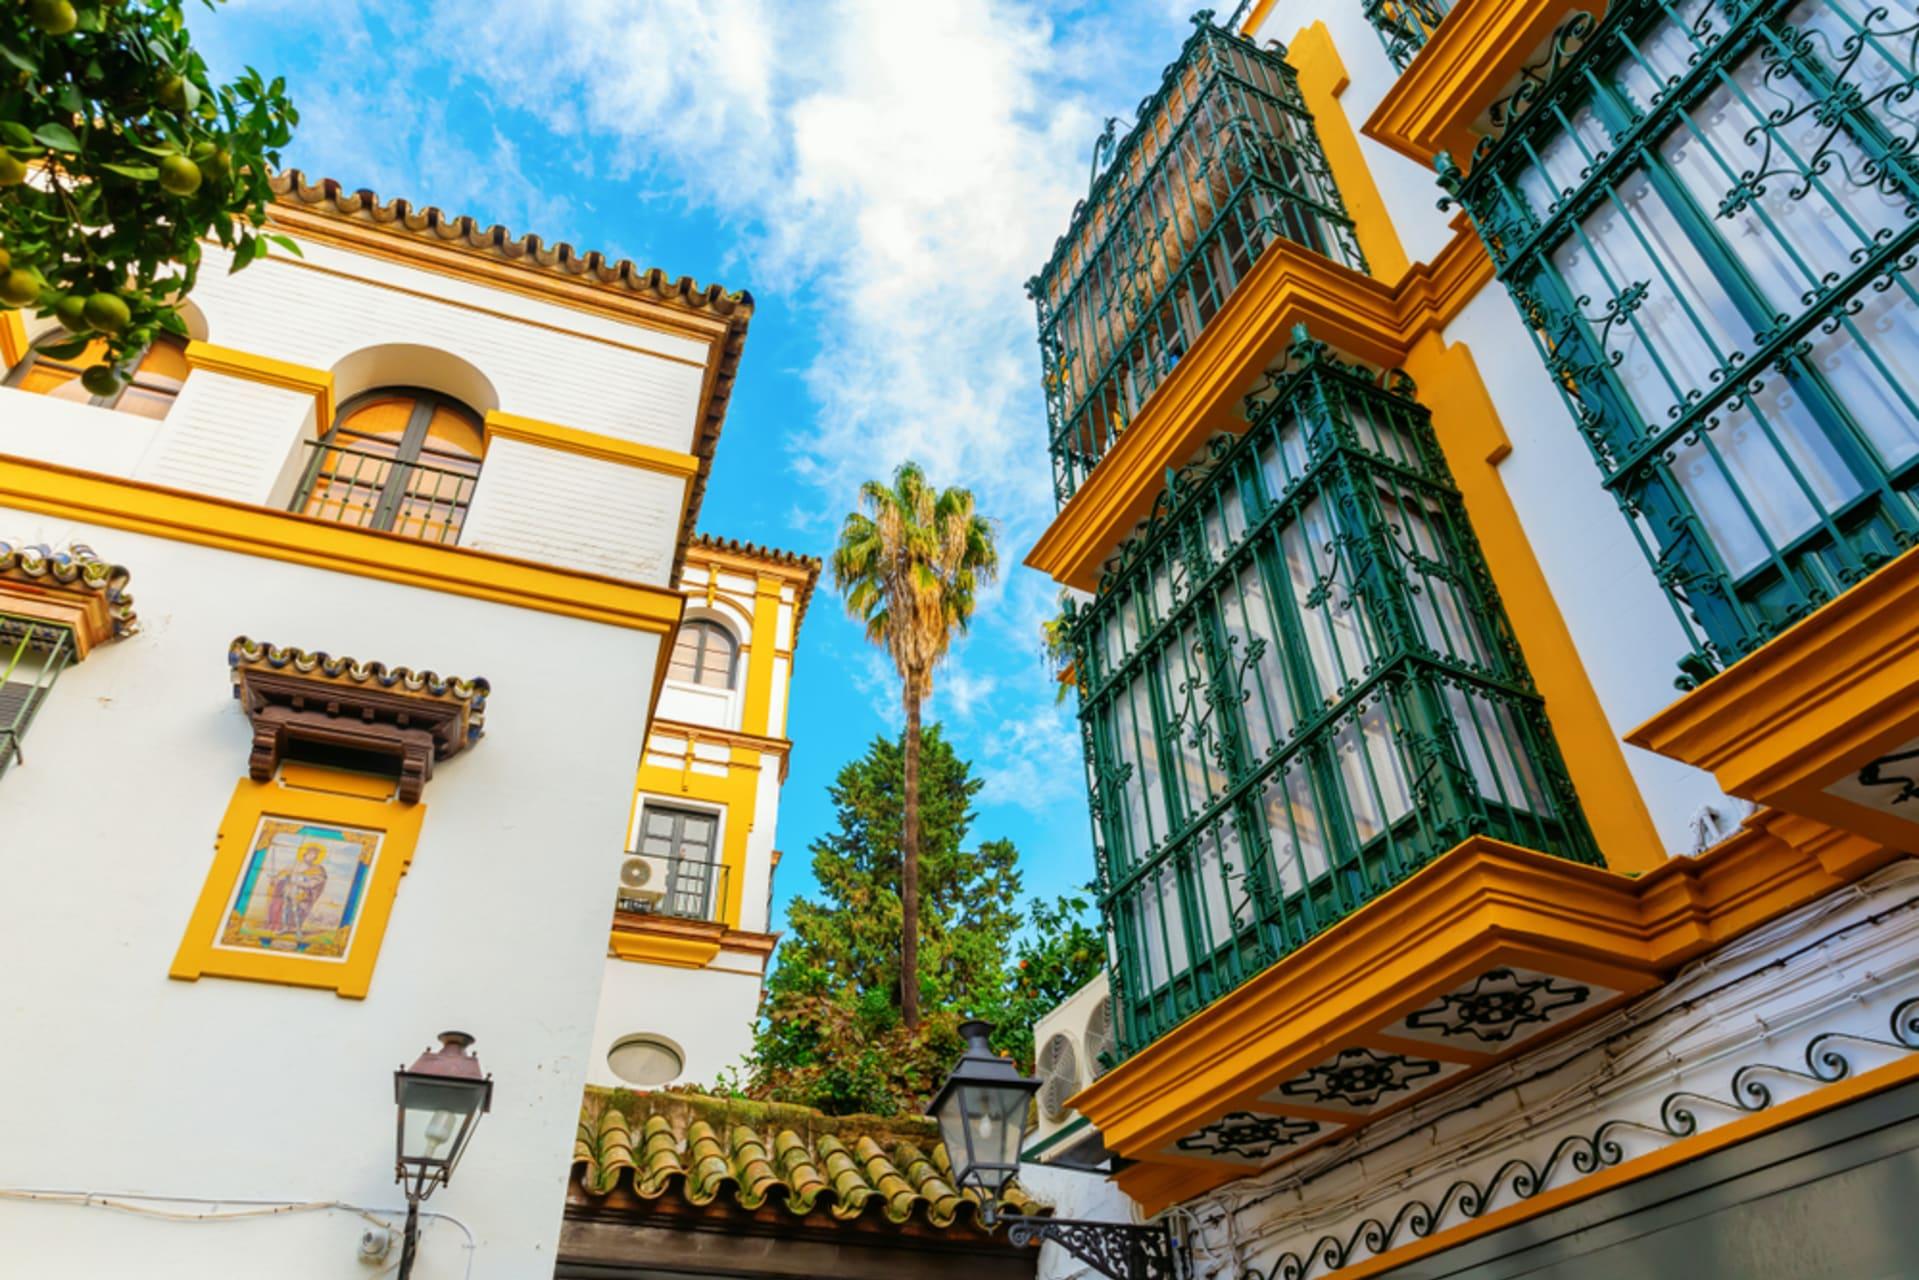 Seville - The Quiet Beauty of Seville's Jewish Quarter